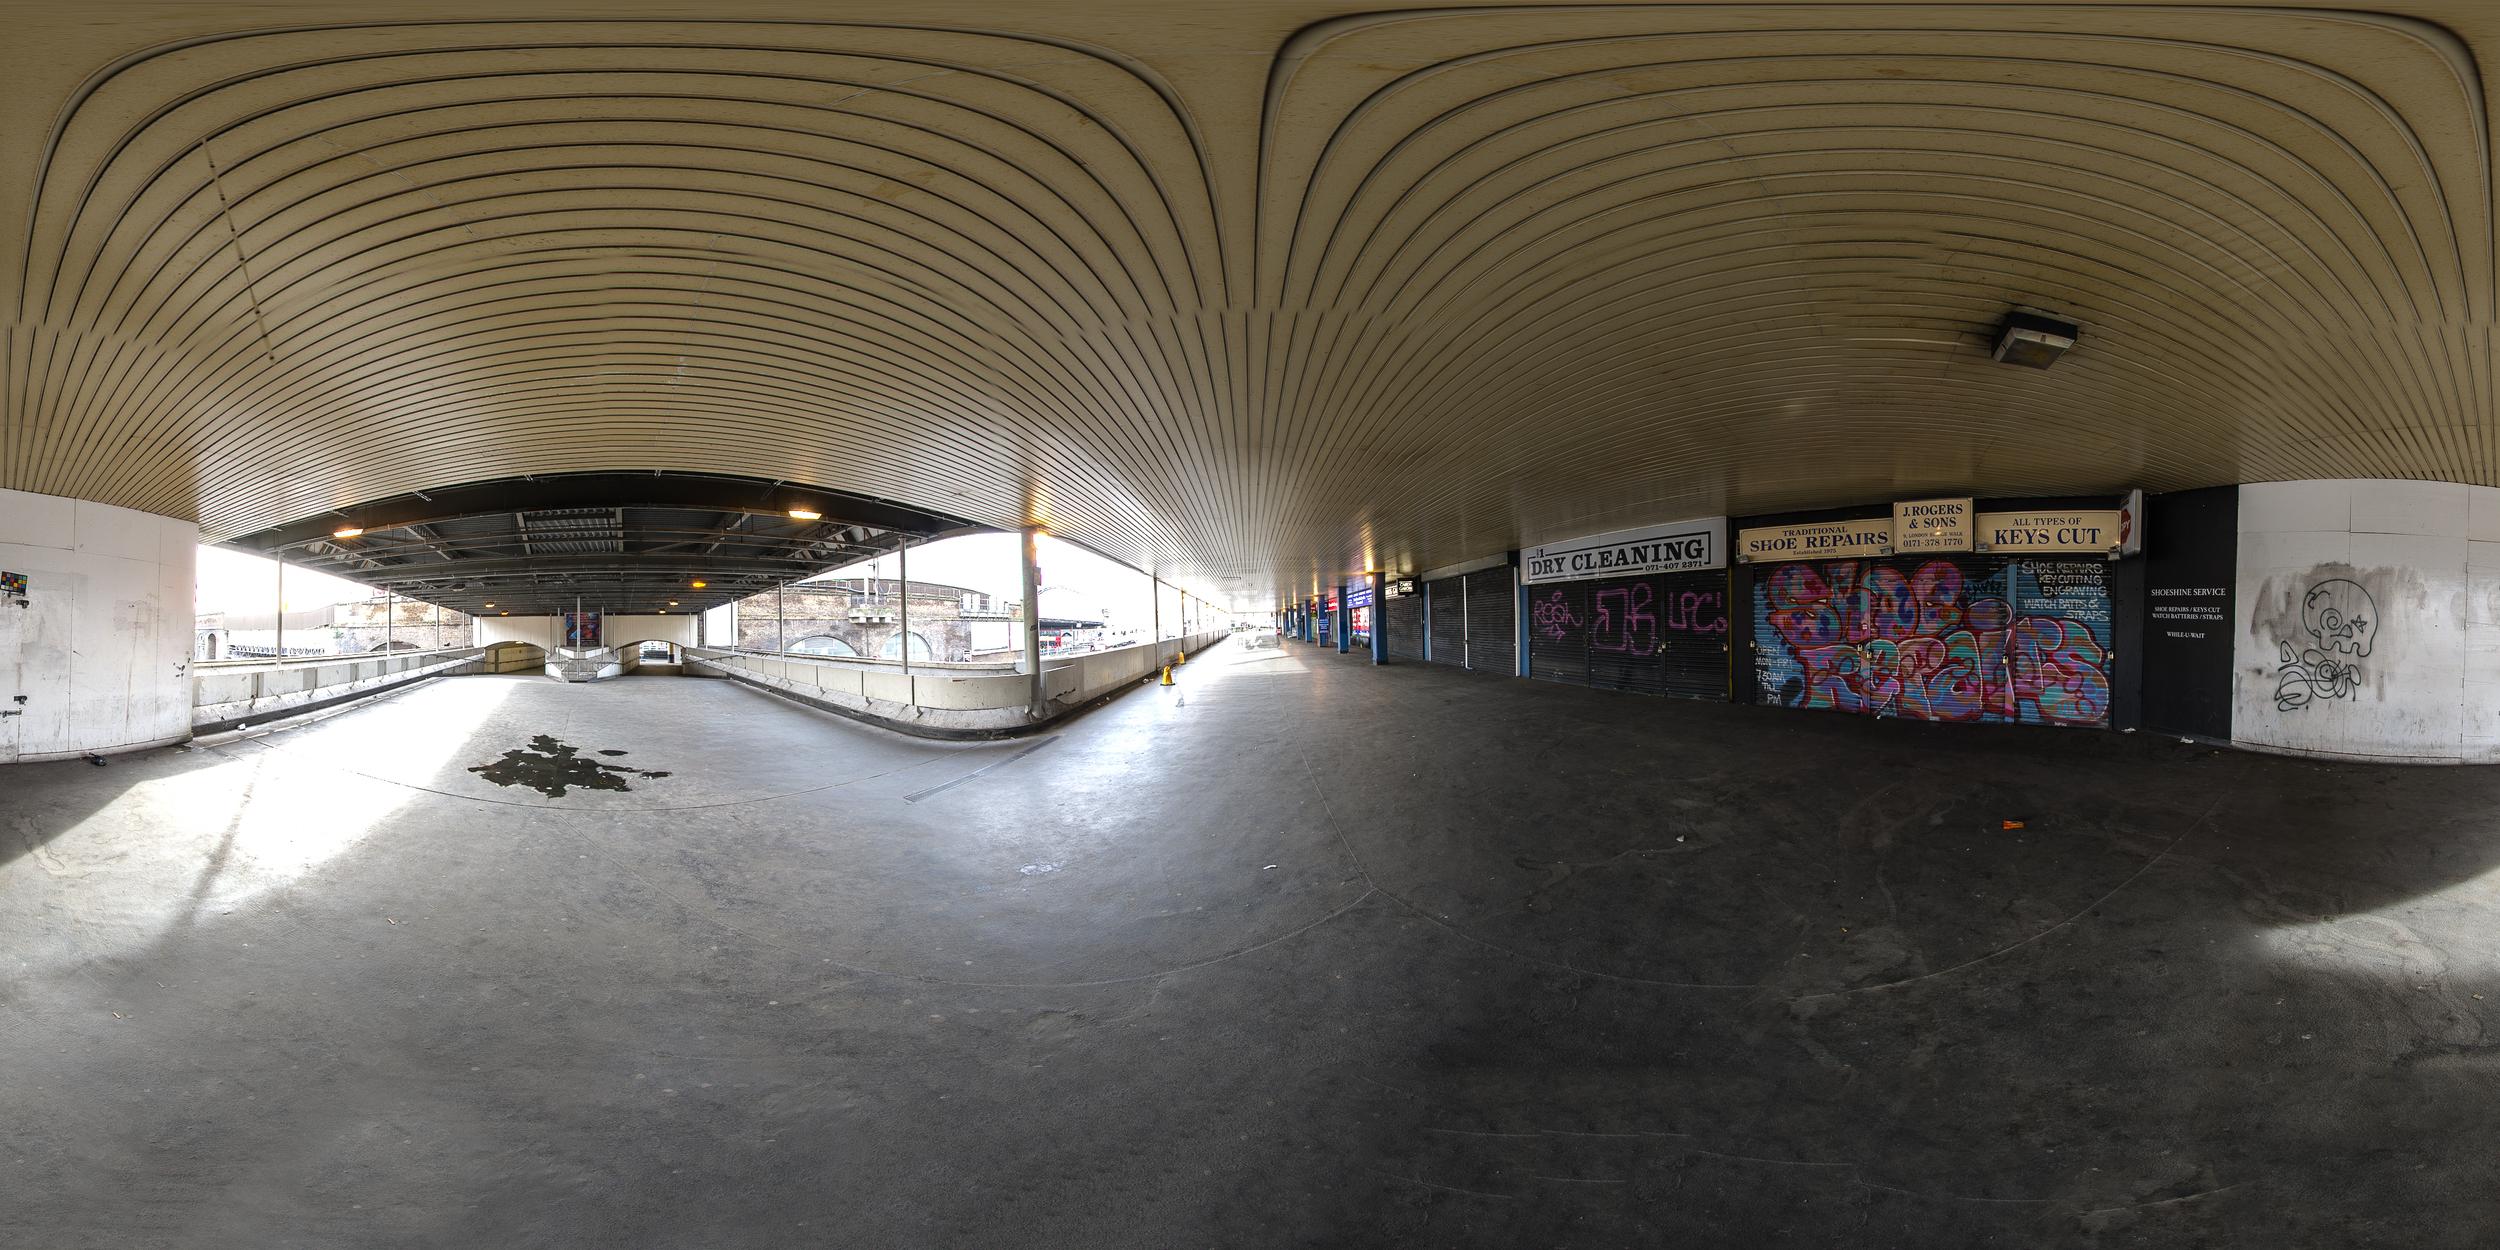 Equirectangular panorama. Click to enlarge.